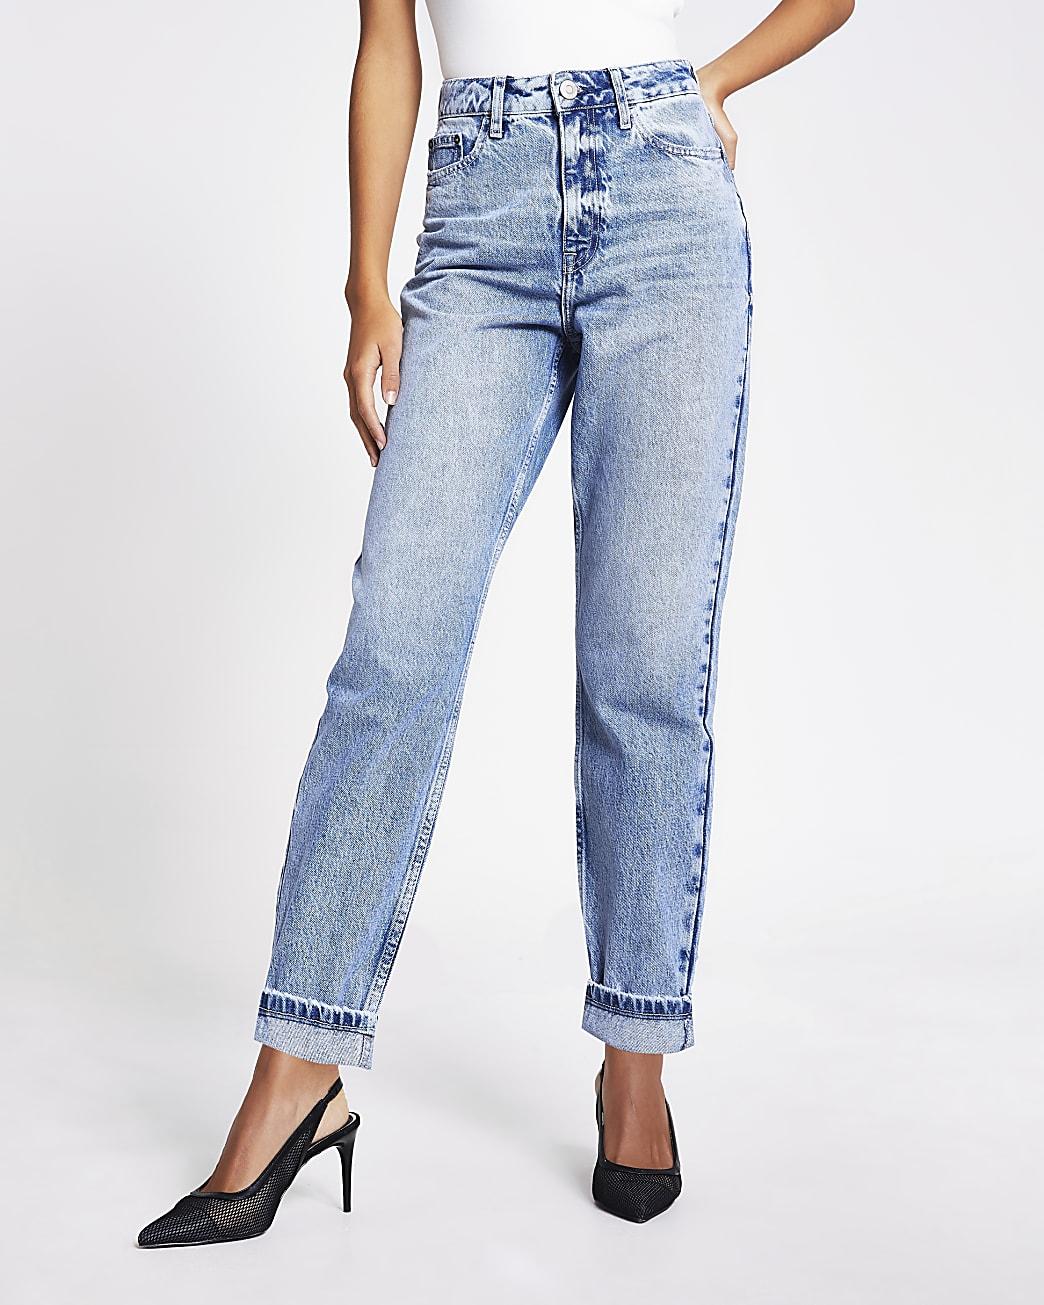 Light blue Carrie high waisted Mom jeans